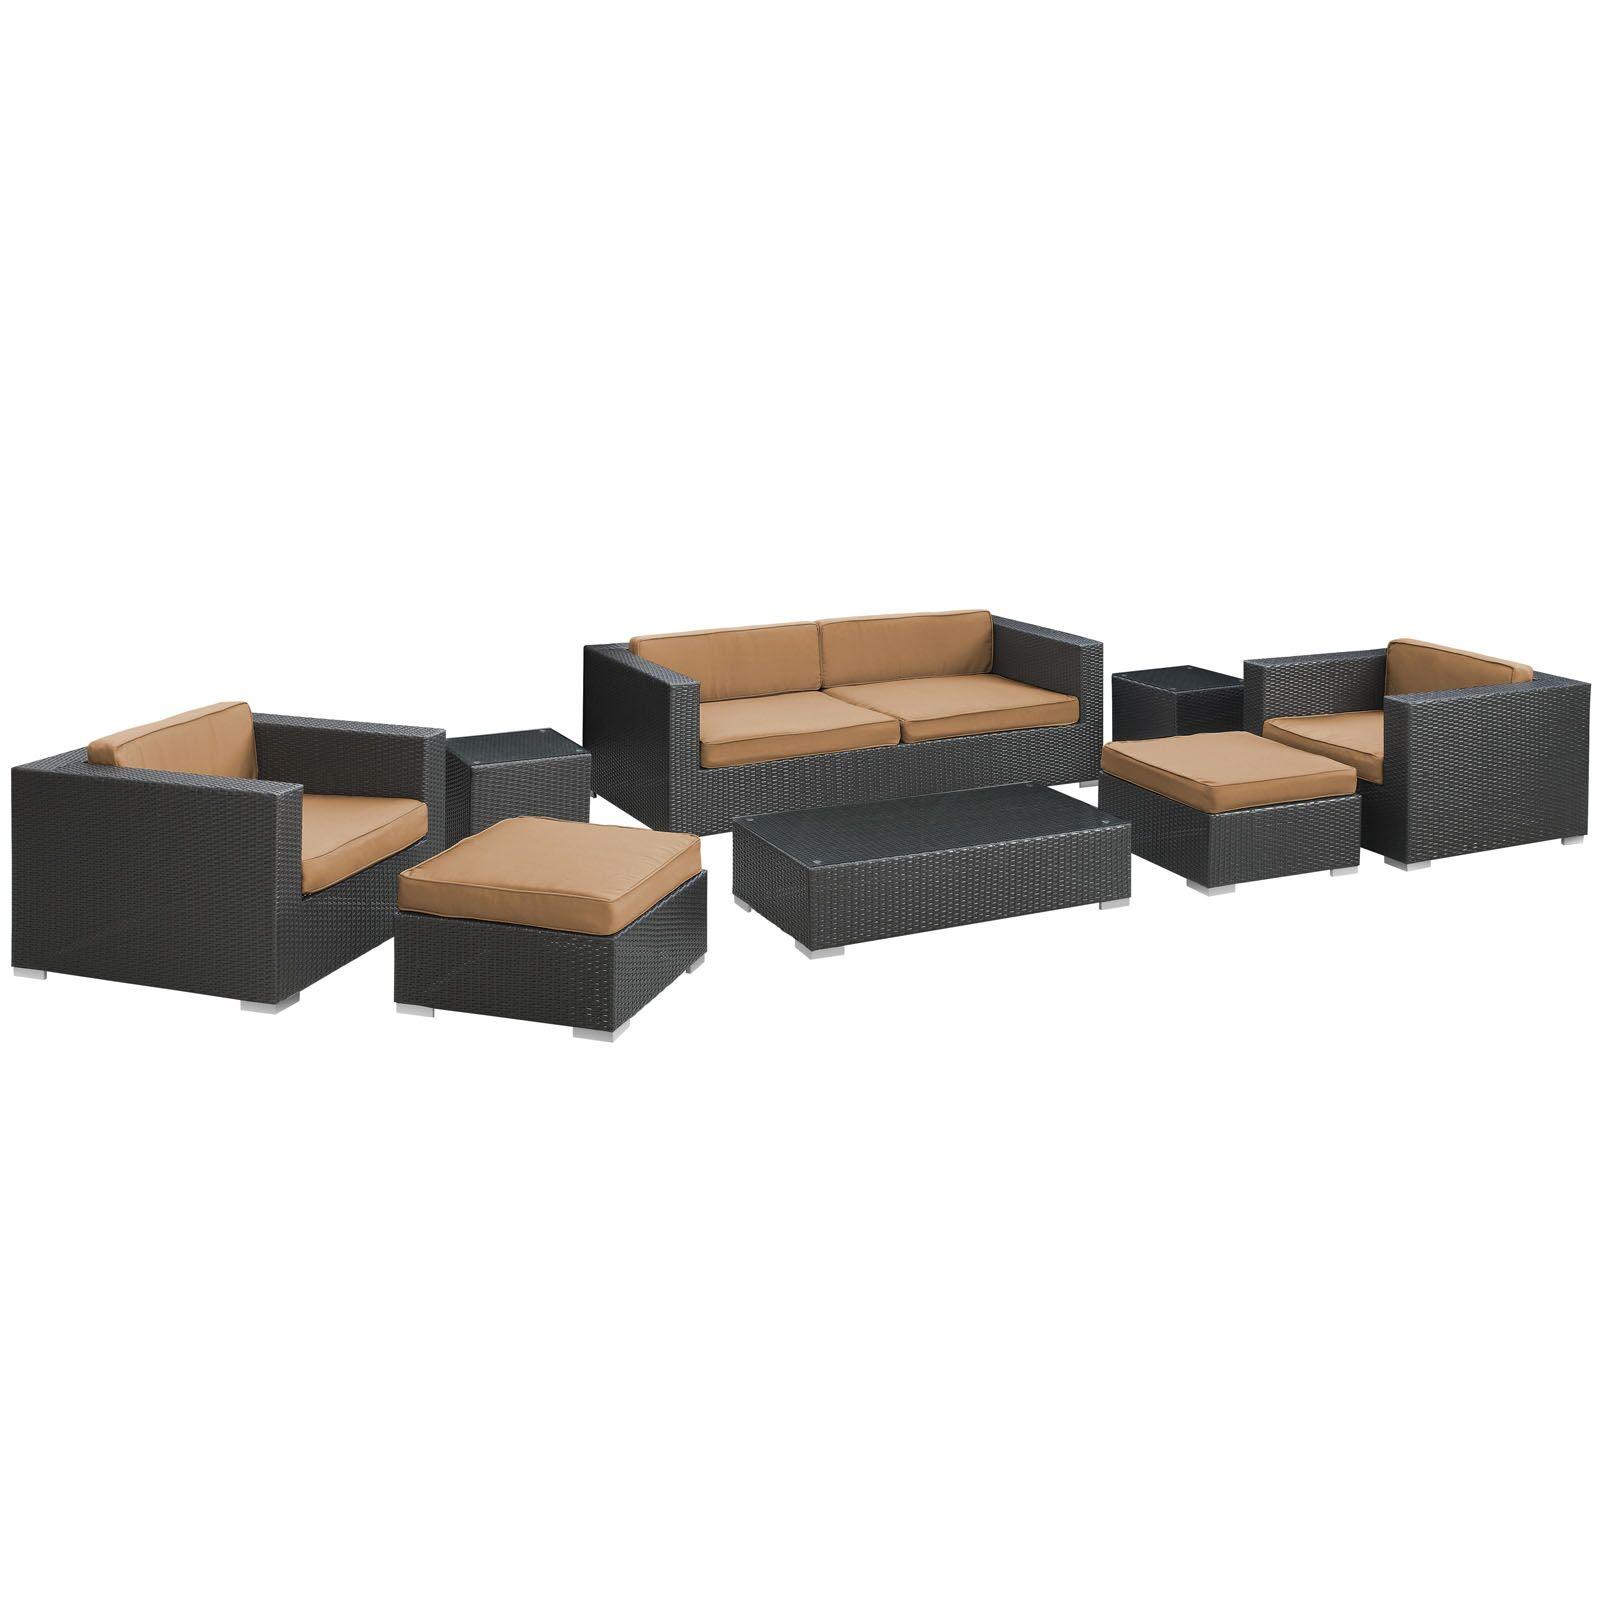 Venice 8 Piece Rattan Sofa Set with Cushions Color: Espresso, Fabric: Mocha